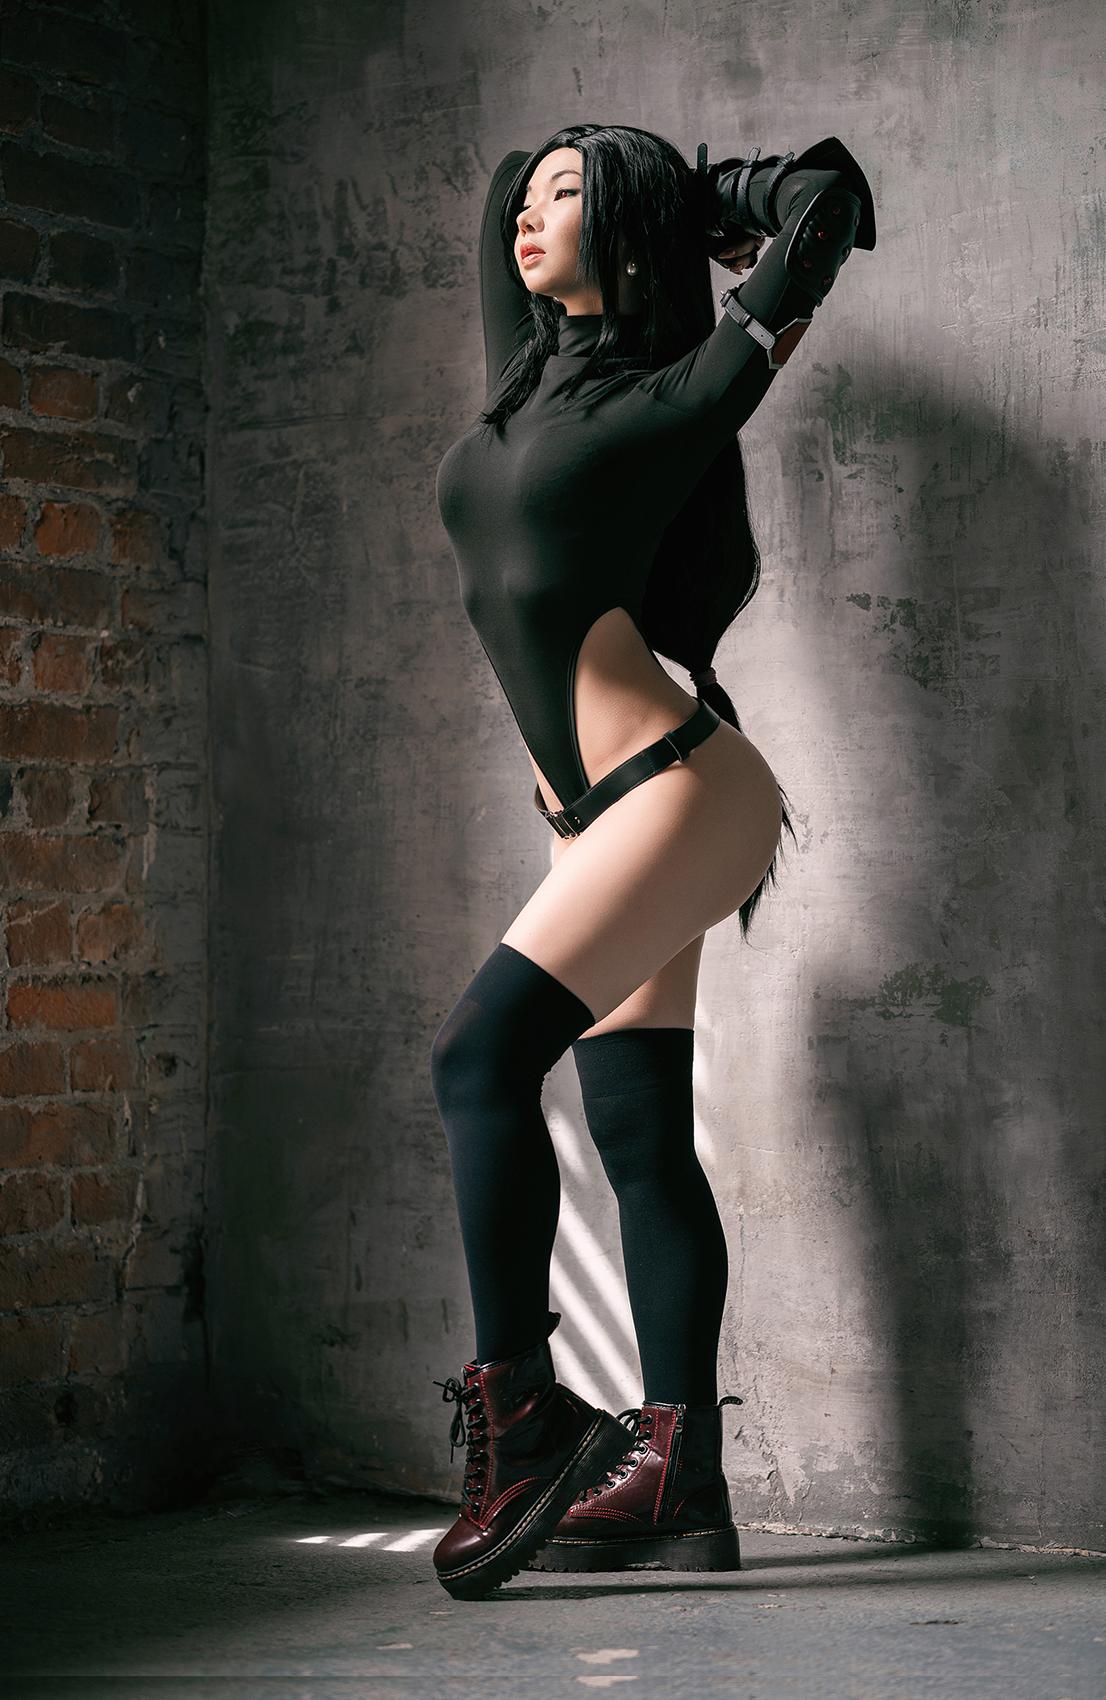 Tifa Lockhart from Final Fantasy